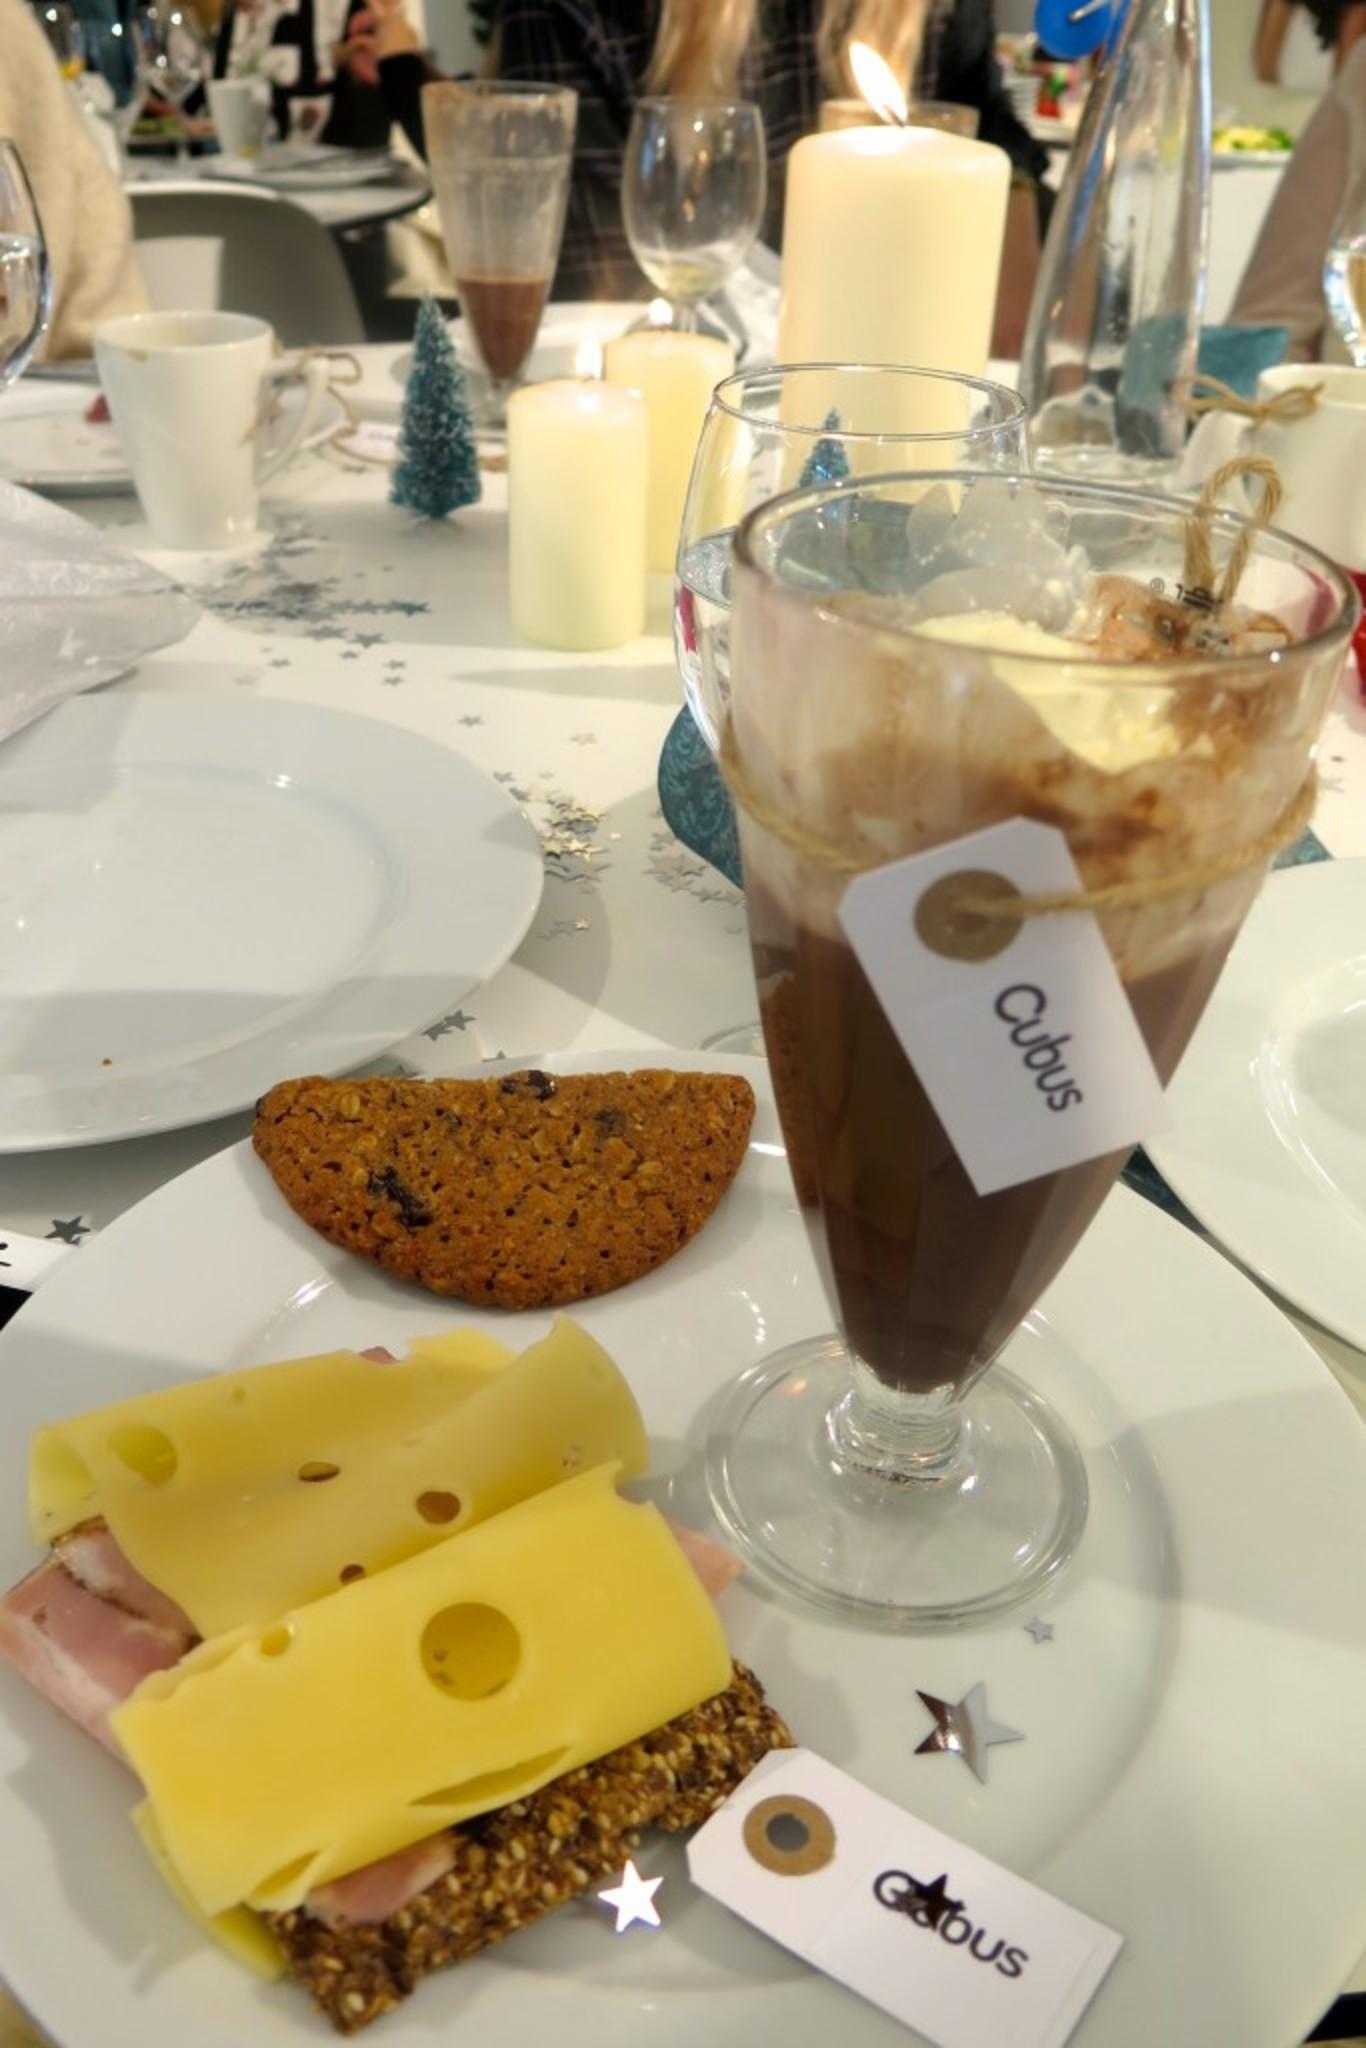 Cubus Breakfast at Gambit PR agency.